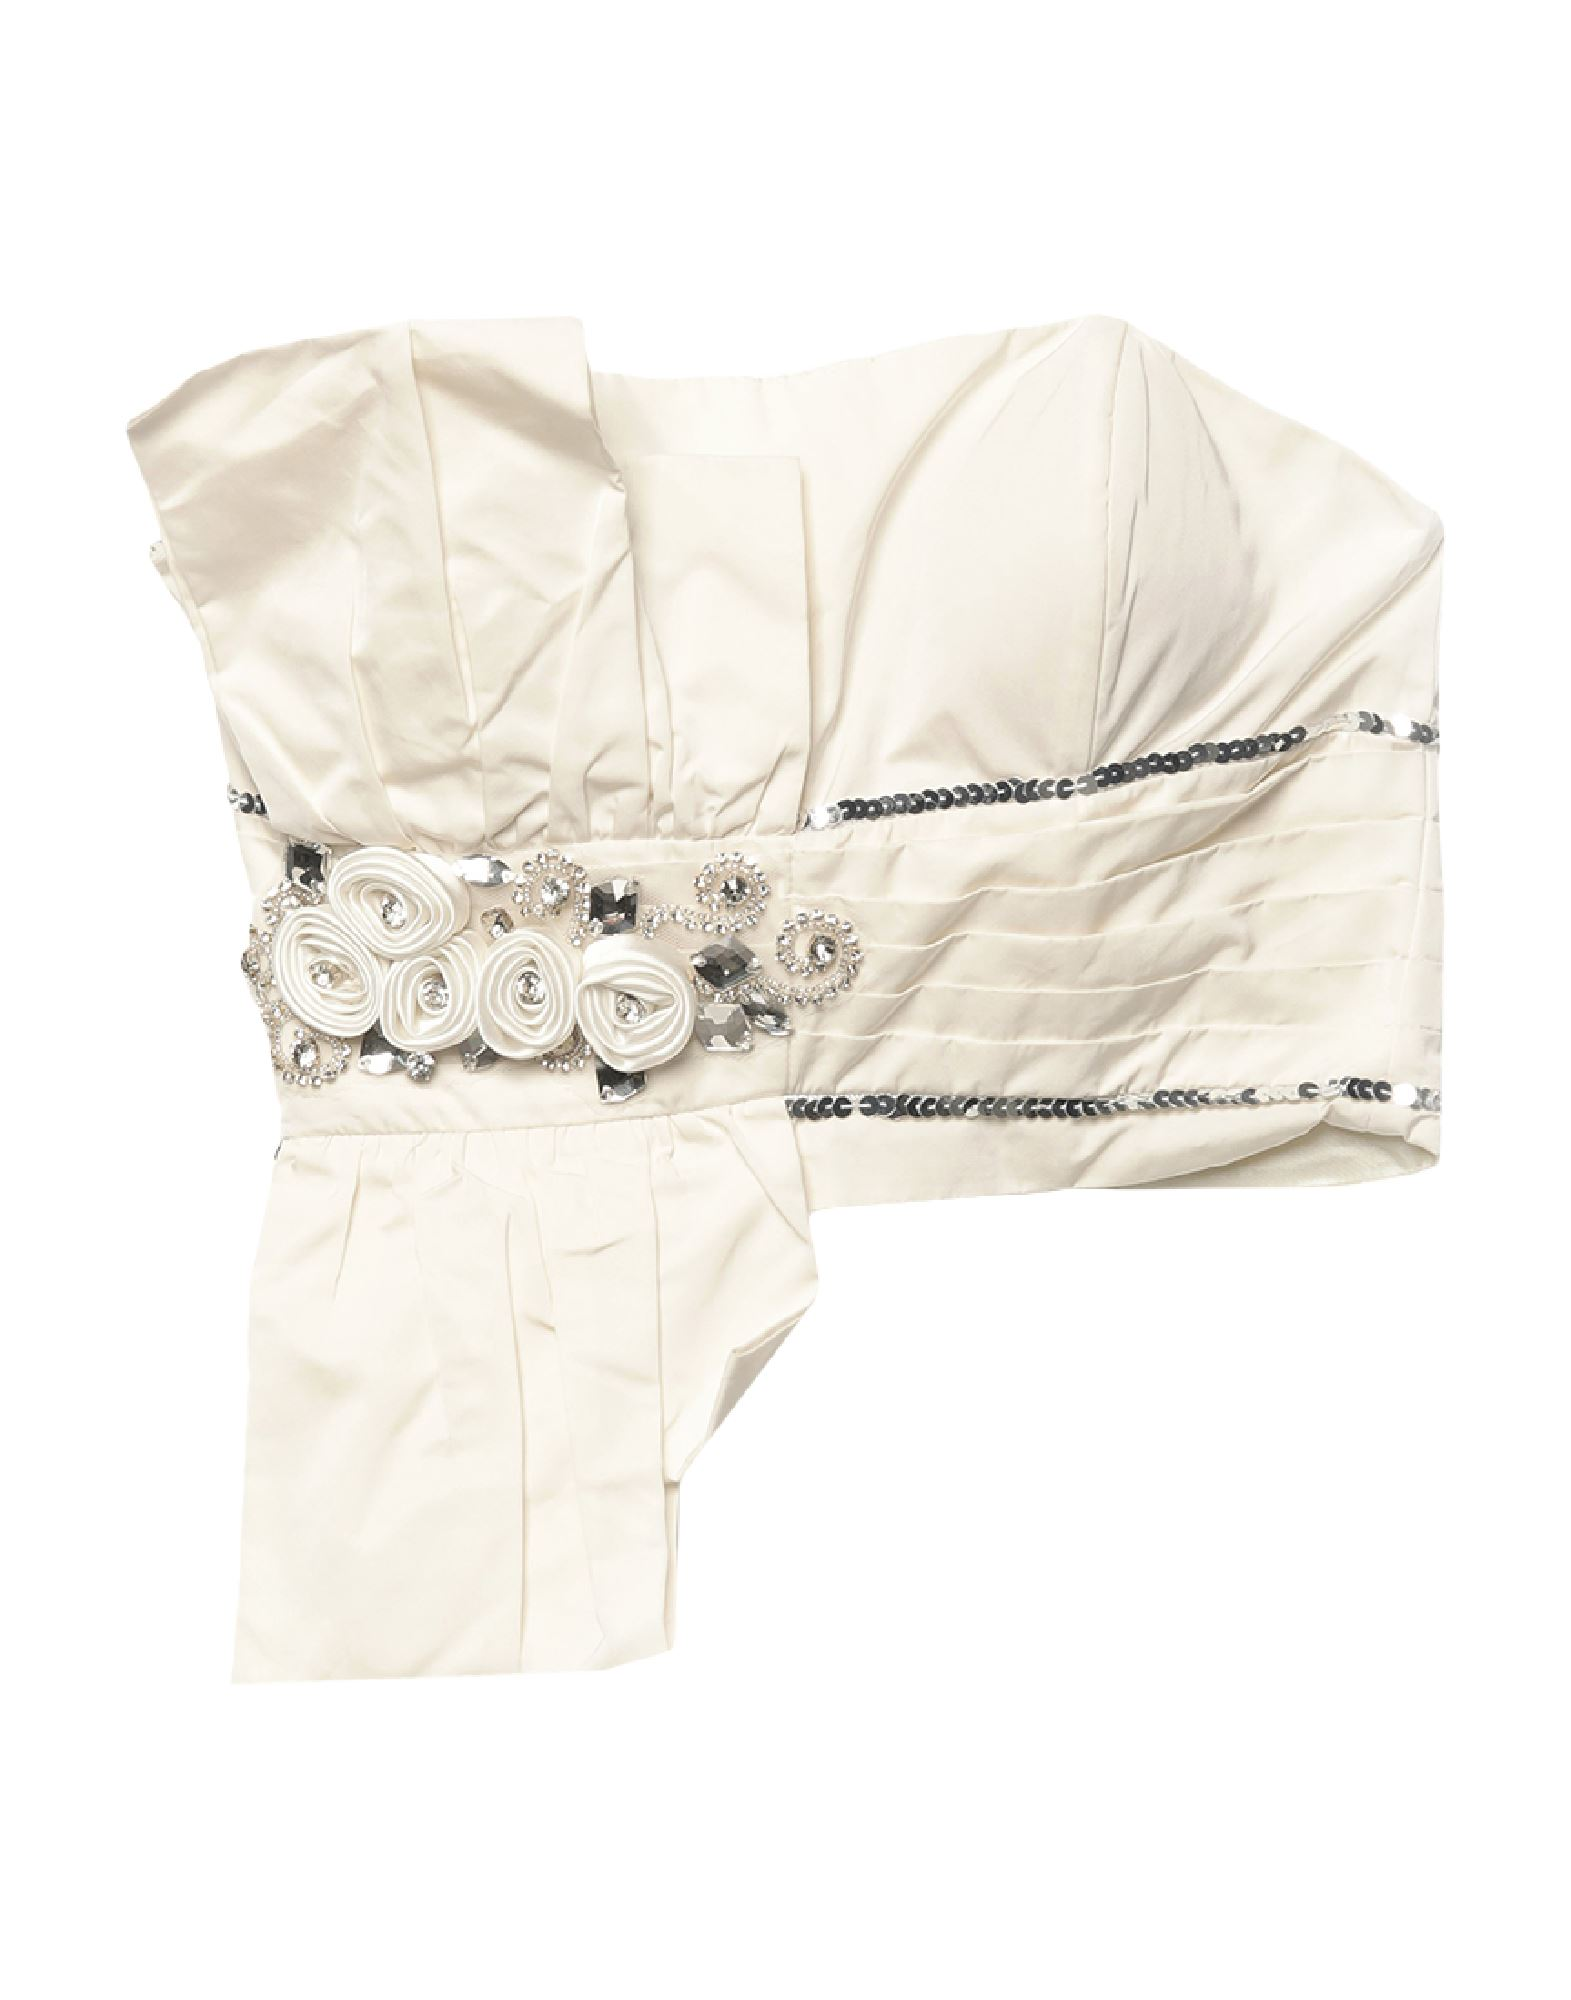 MM6 MAISON MARGIELA Tube tops. plain weave, rhinestones, sequins, solid color, square neckline, sleeveless, rear closure, zipper closure, no pockets. 100% Polyester